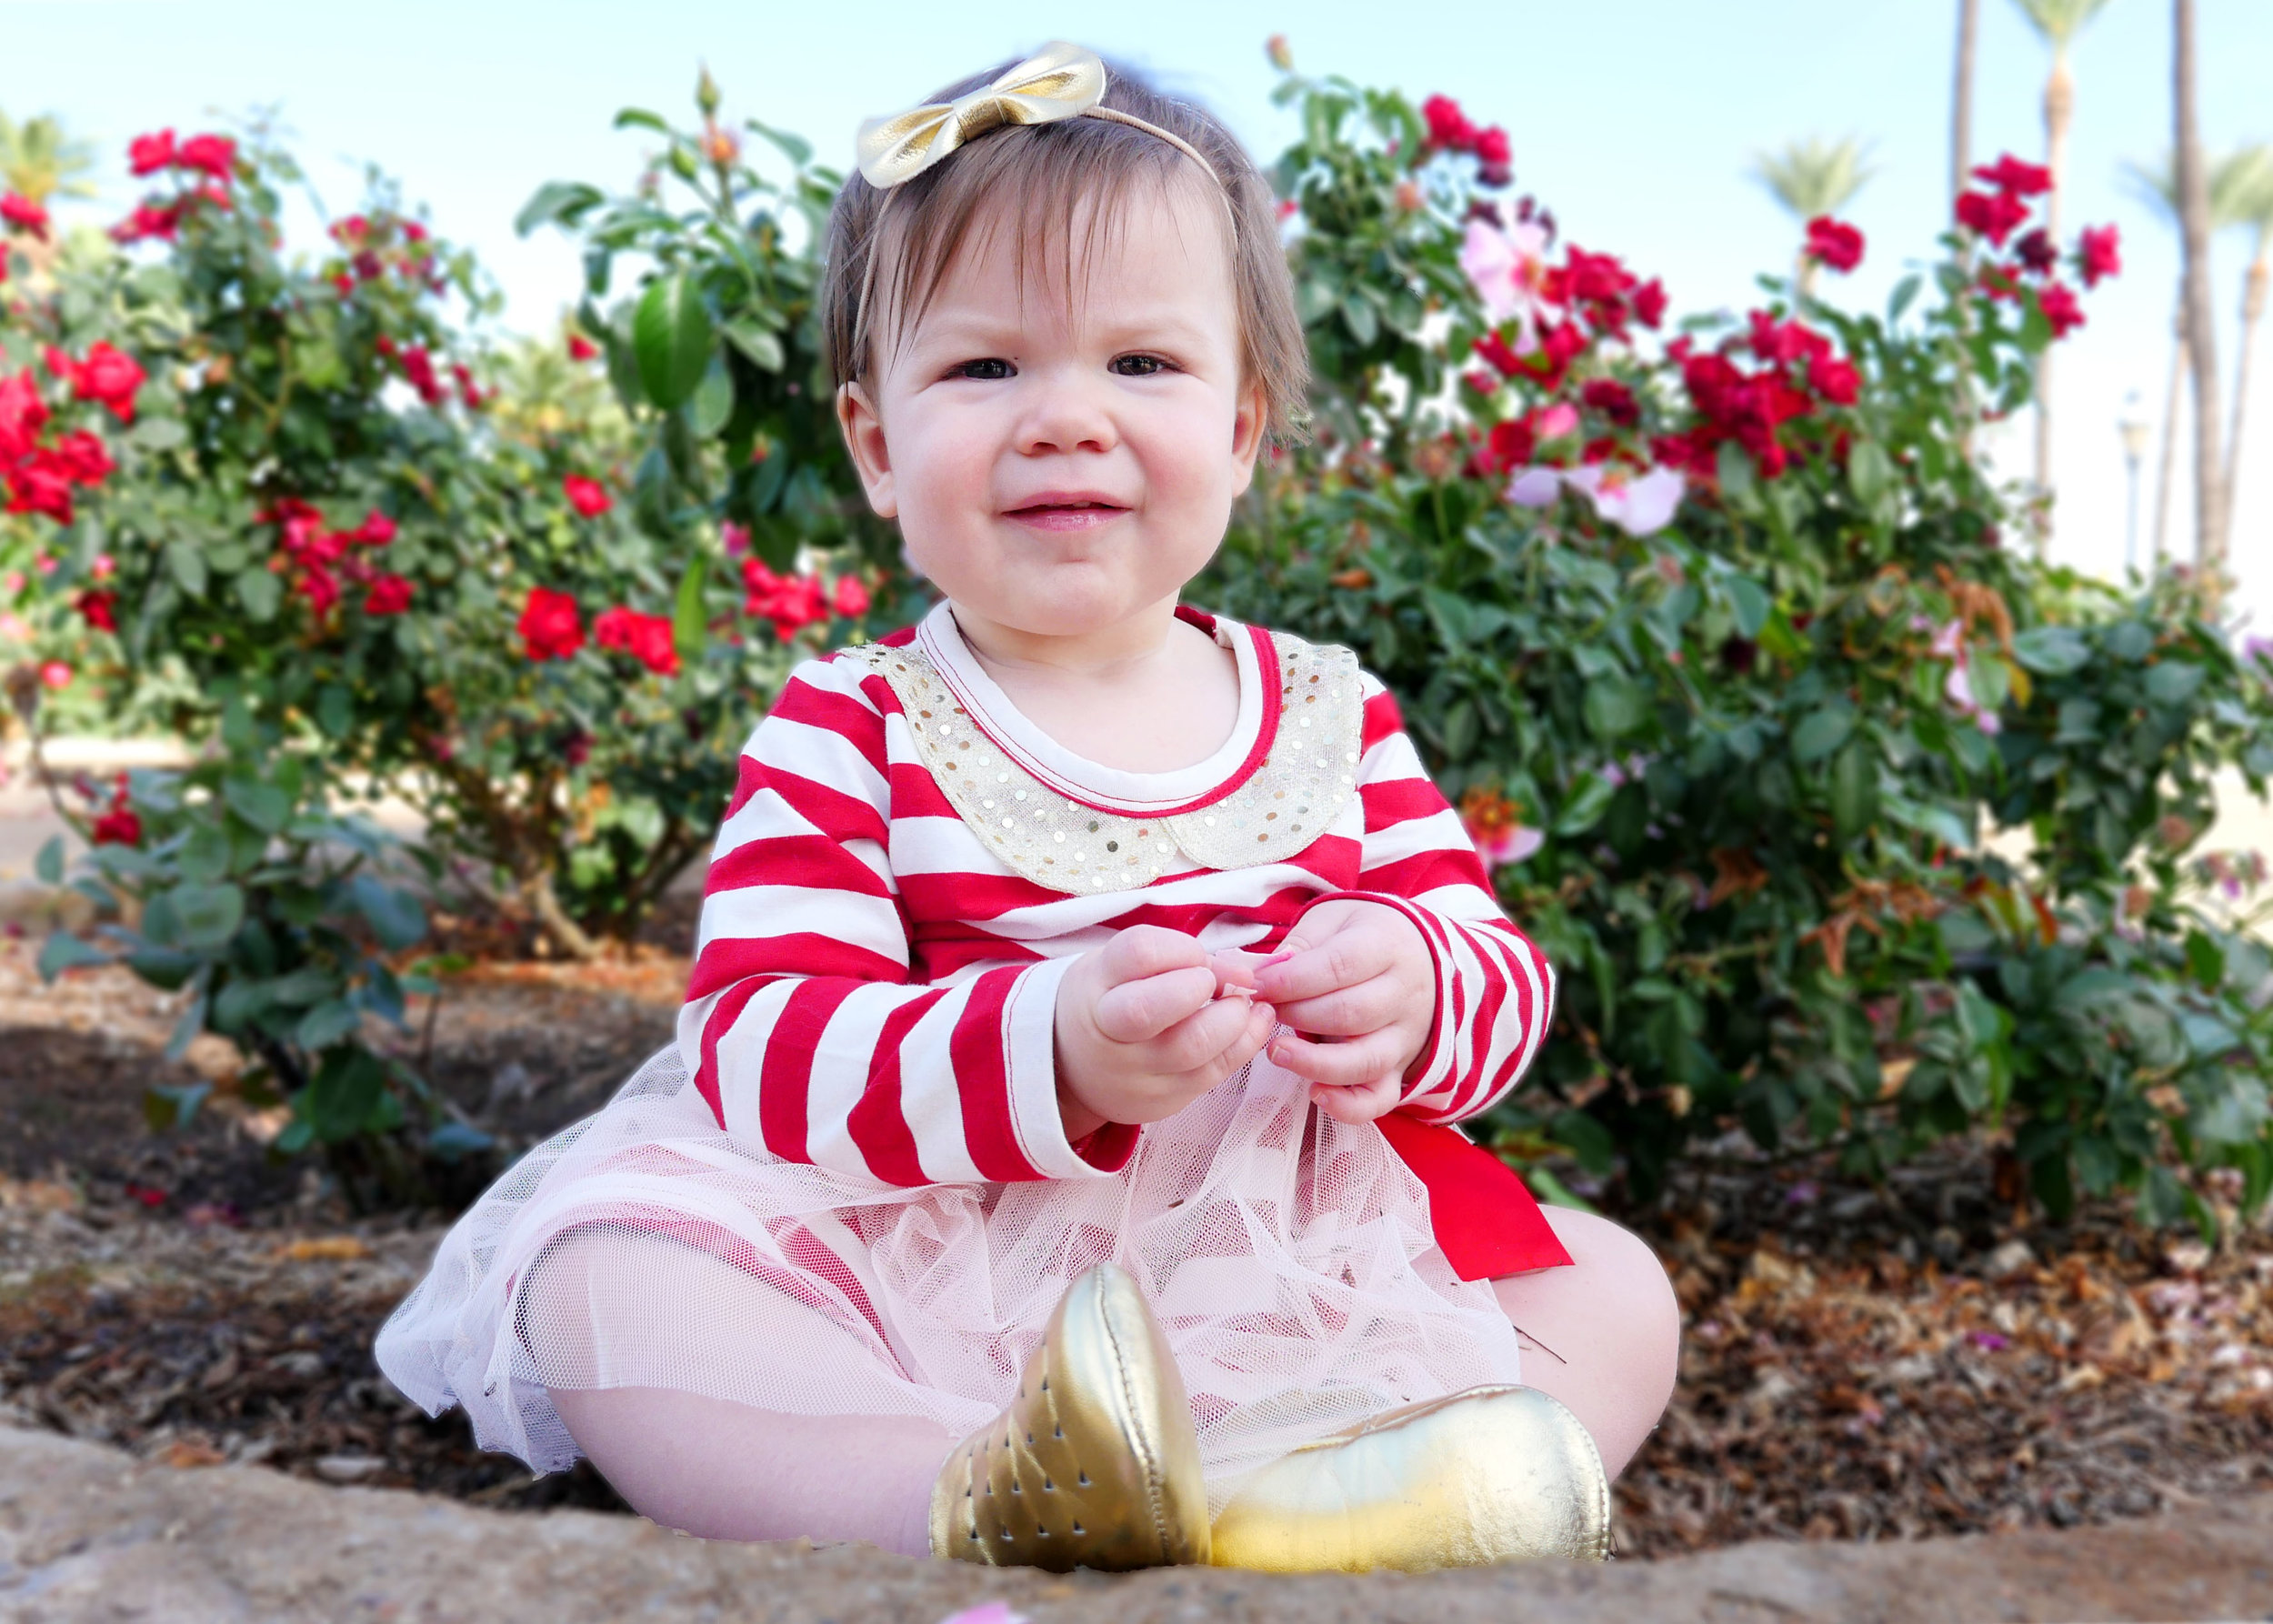 Sumrall Family Photos 18 –Christie Lukes Photography.jpg